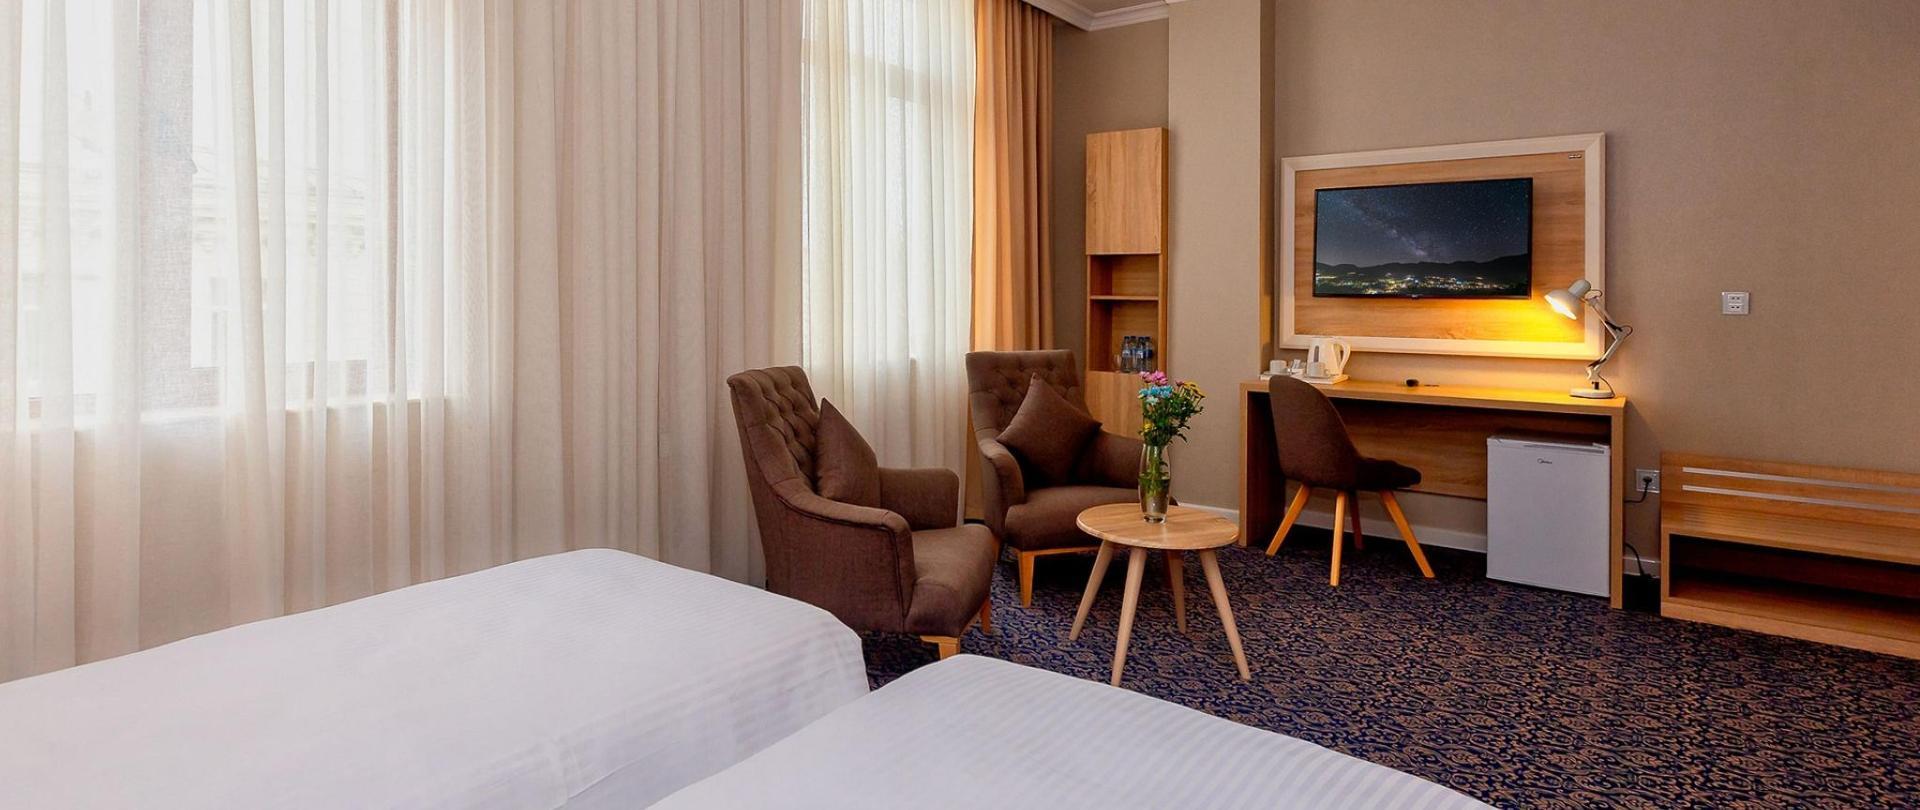 Metrocity Hotel-24.jpg